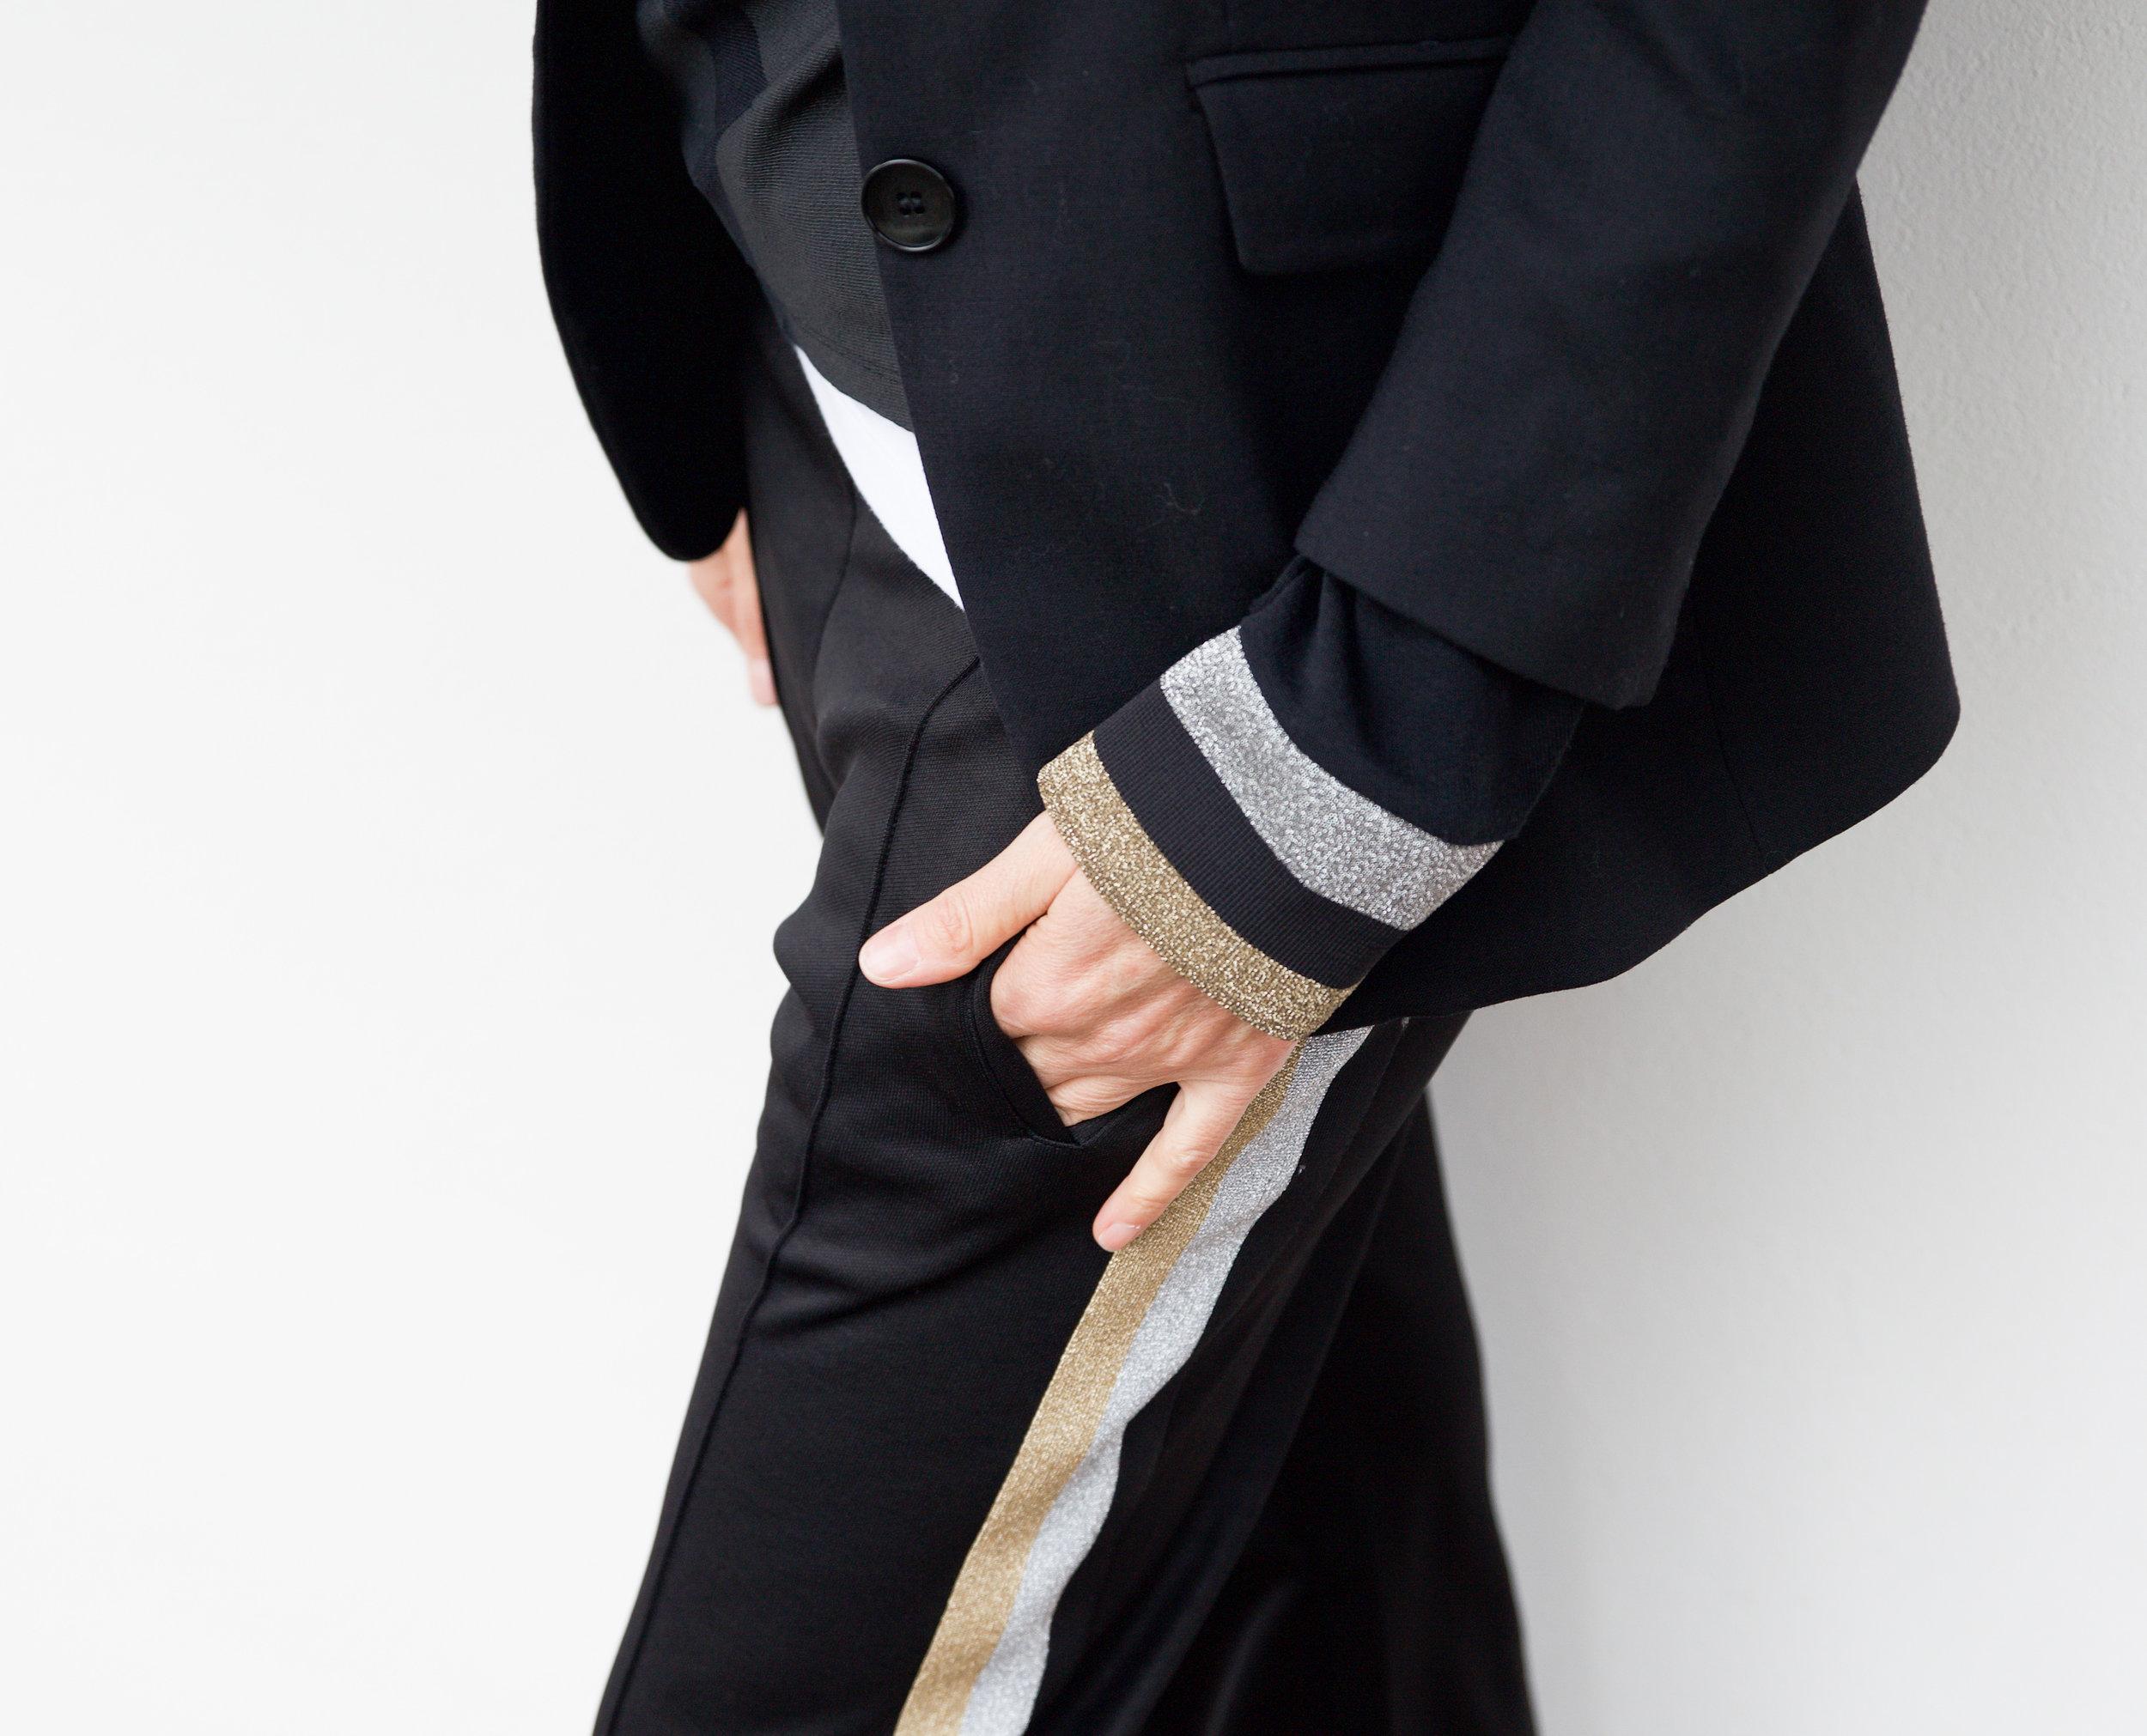 Liv Bergen Look Styling Jogginghose Mode für Frauen über 50 BeFifty Blog